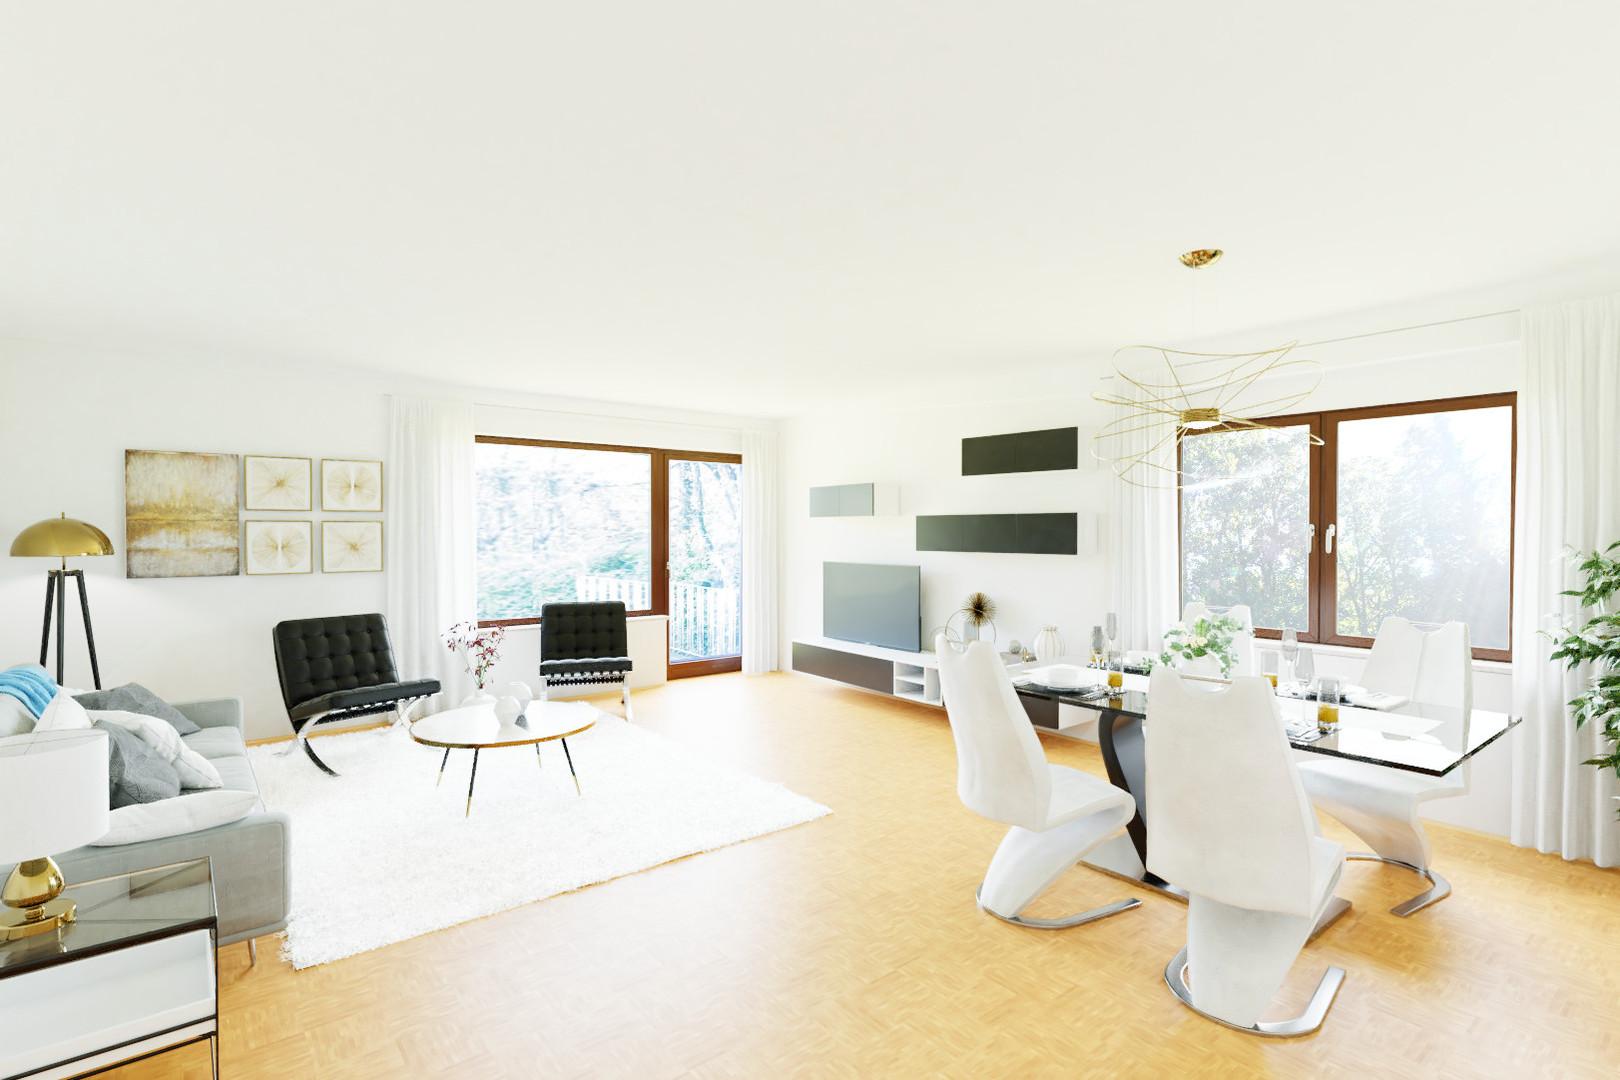 virtuelles Home Staging Würzburg Frauenl